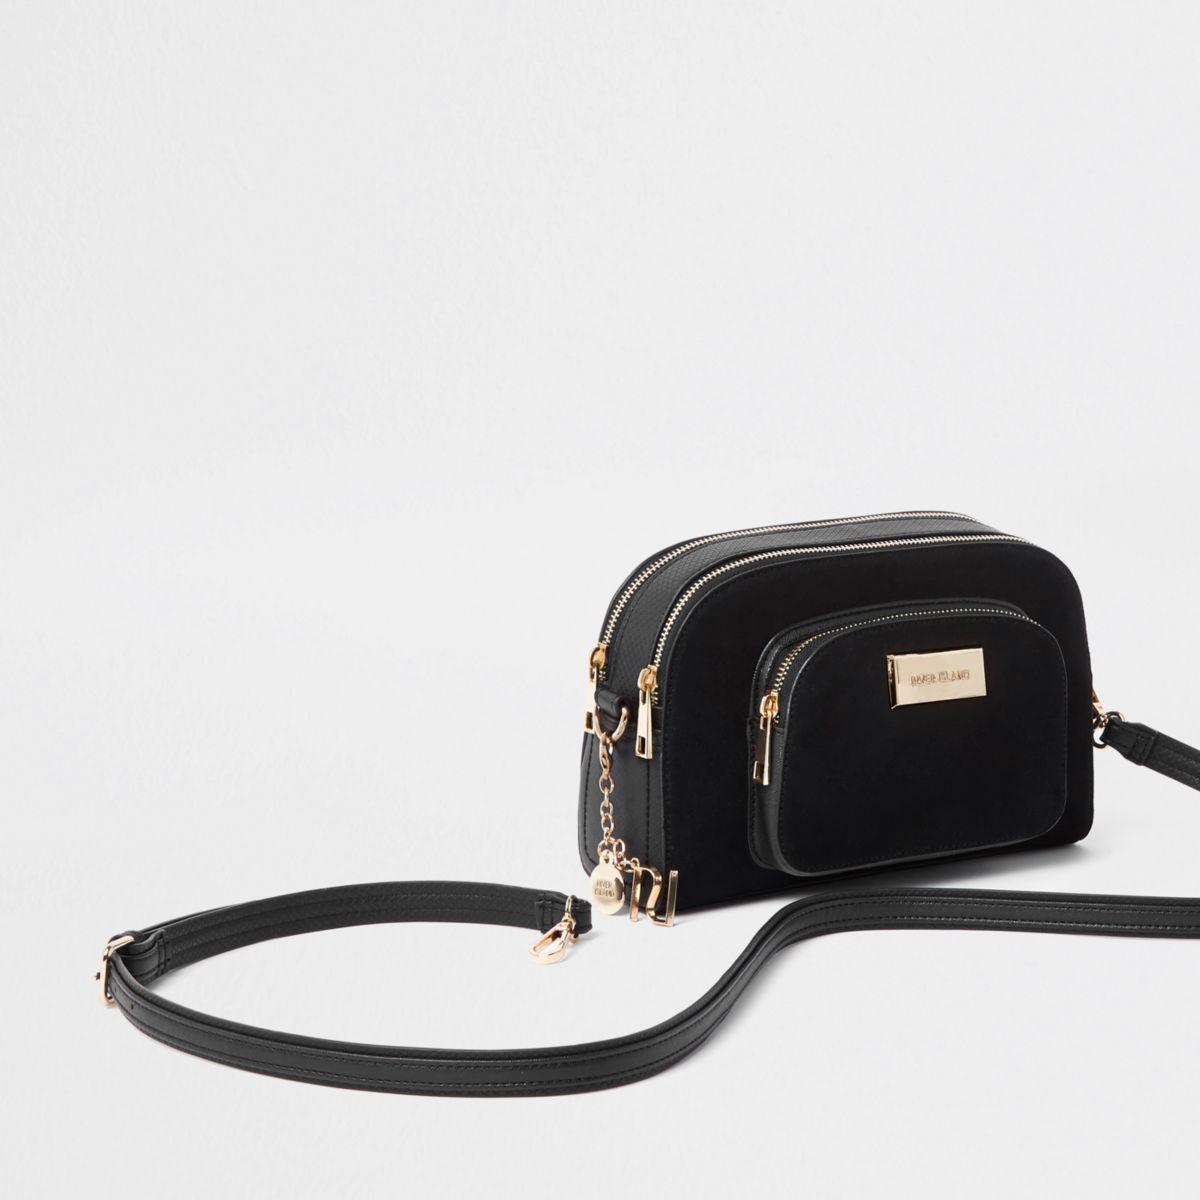 5425301661 Black curved cross body bag - Cross Body Bags - Bags   Purses - women